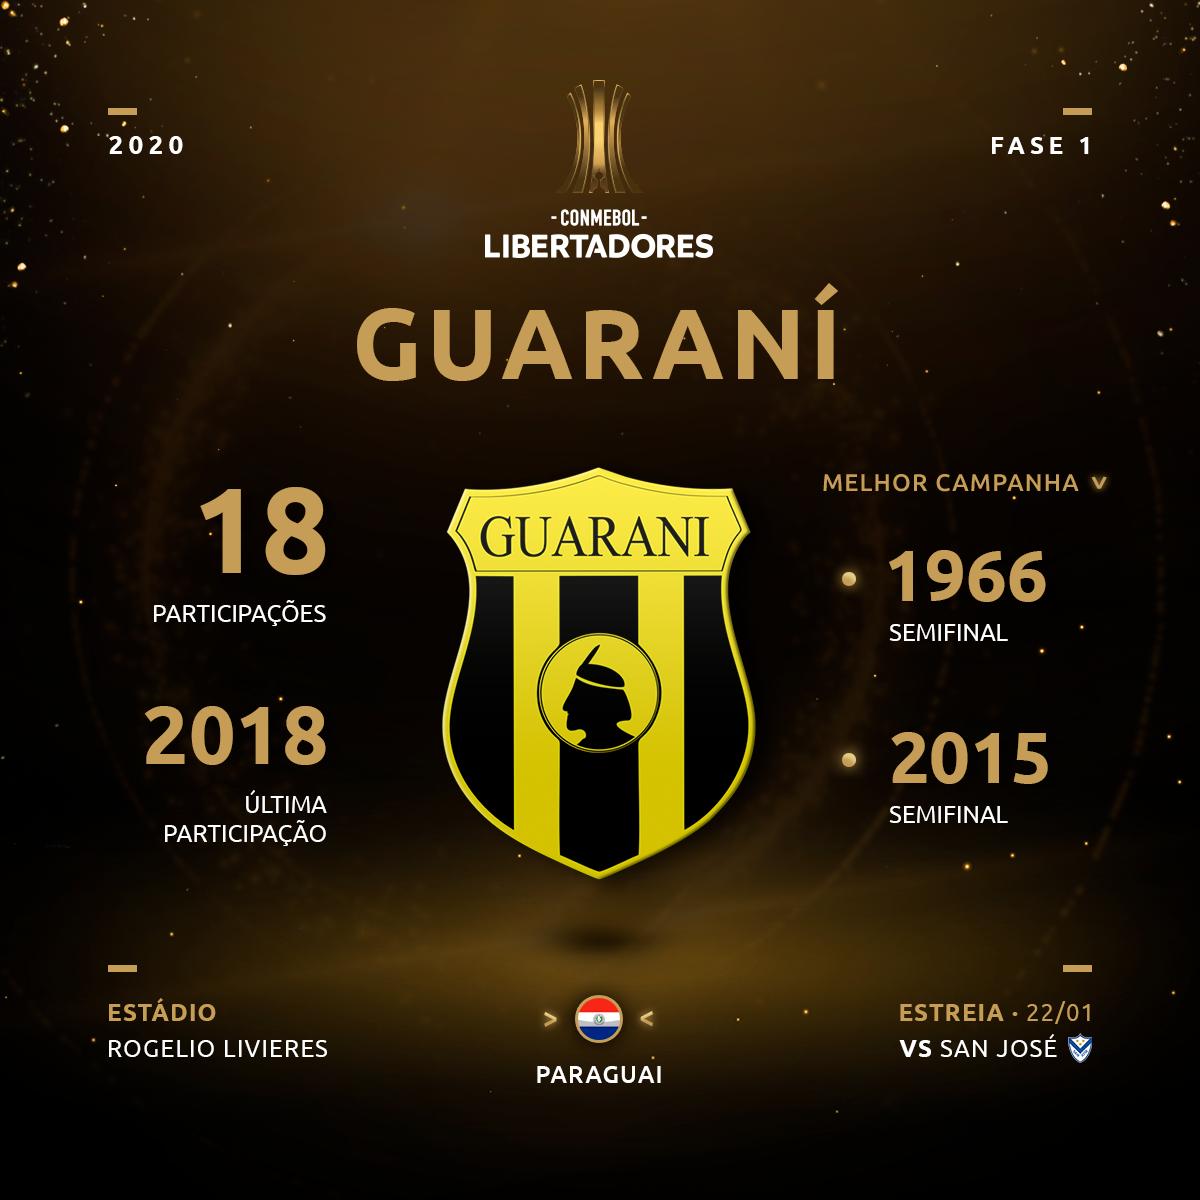 Guaraní - Libertadores 2020